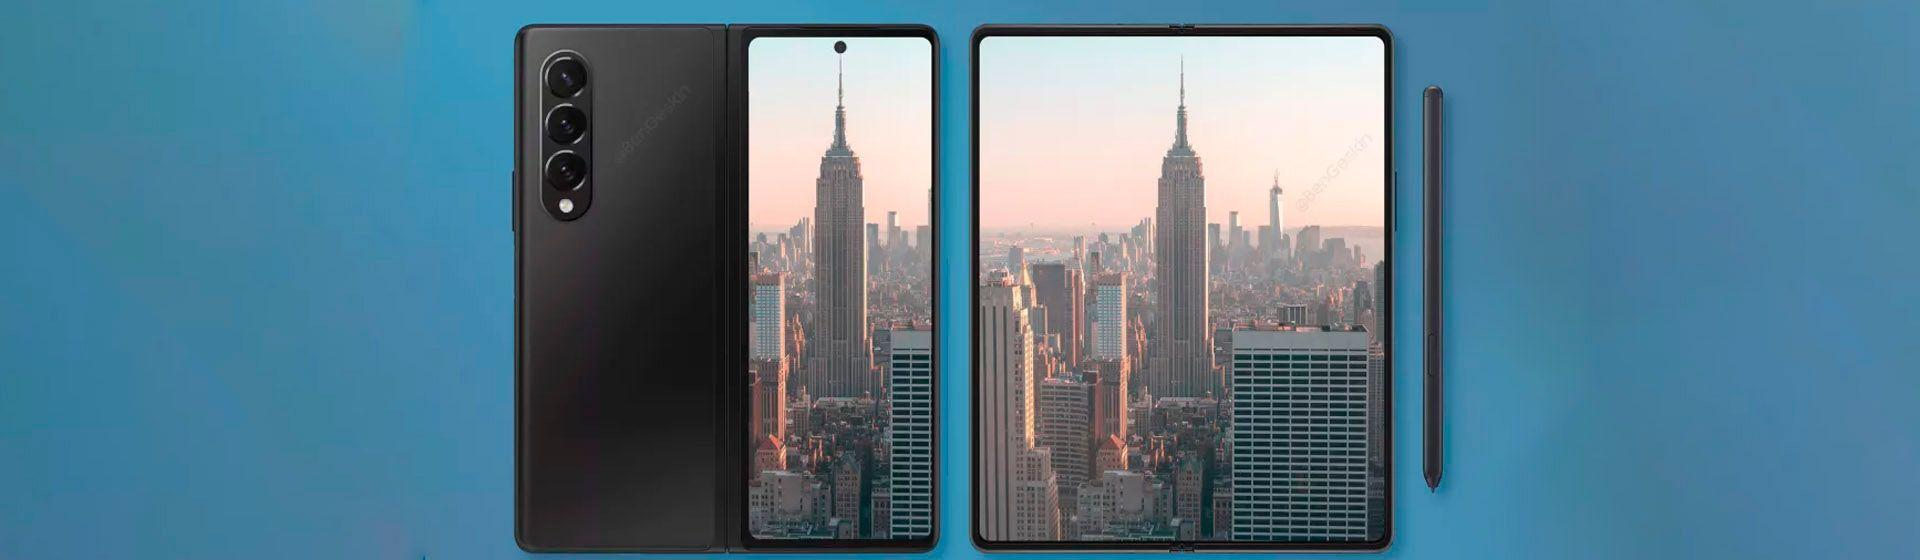 Galaxy Z Fold 3: tudo que sabemos sobre o Samsung dobrável